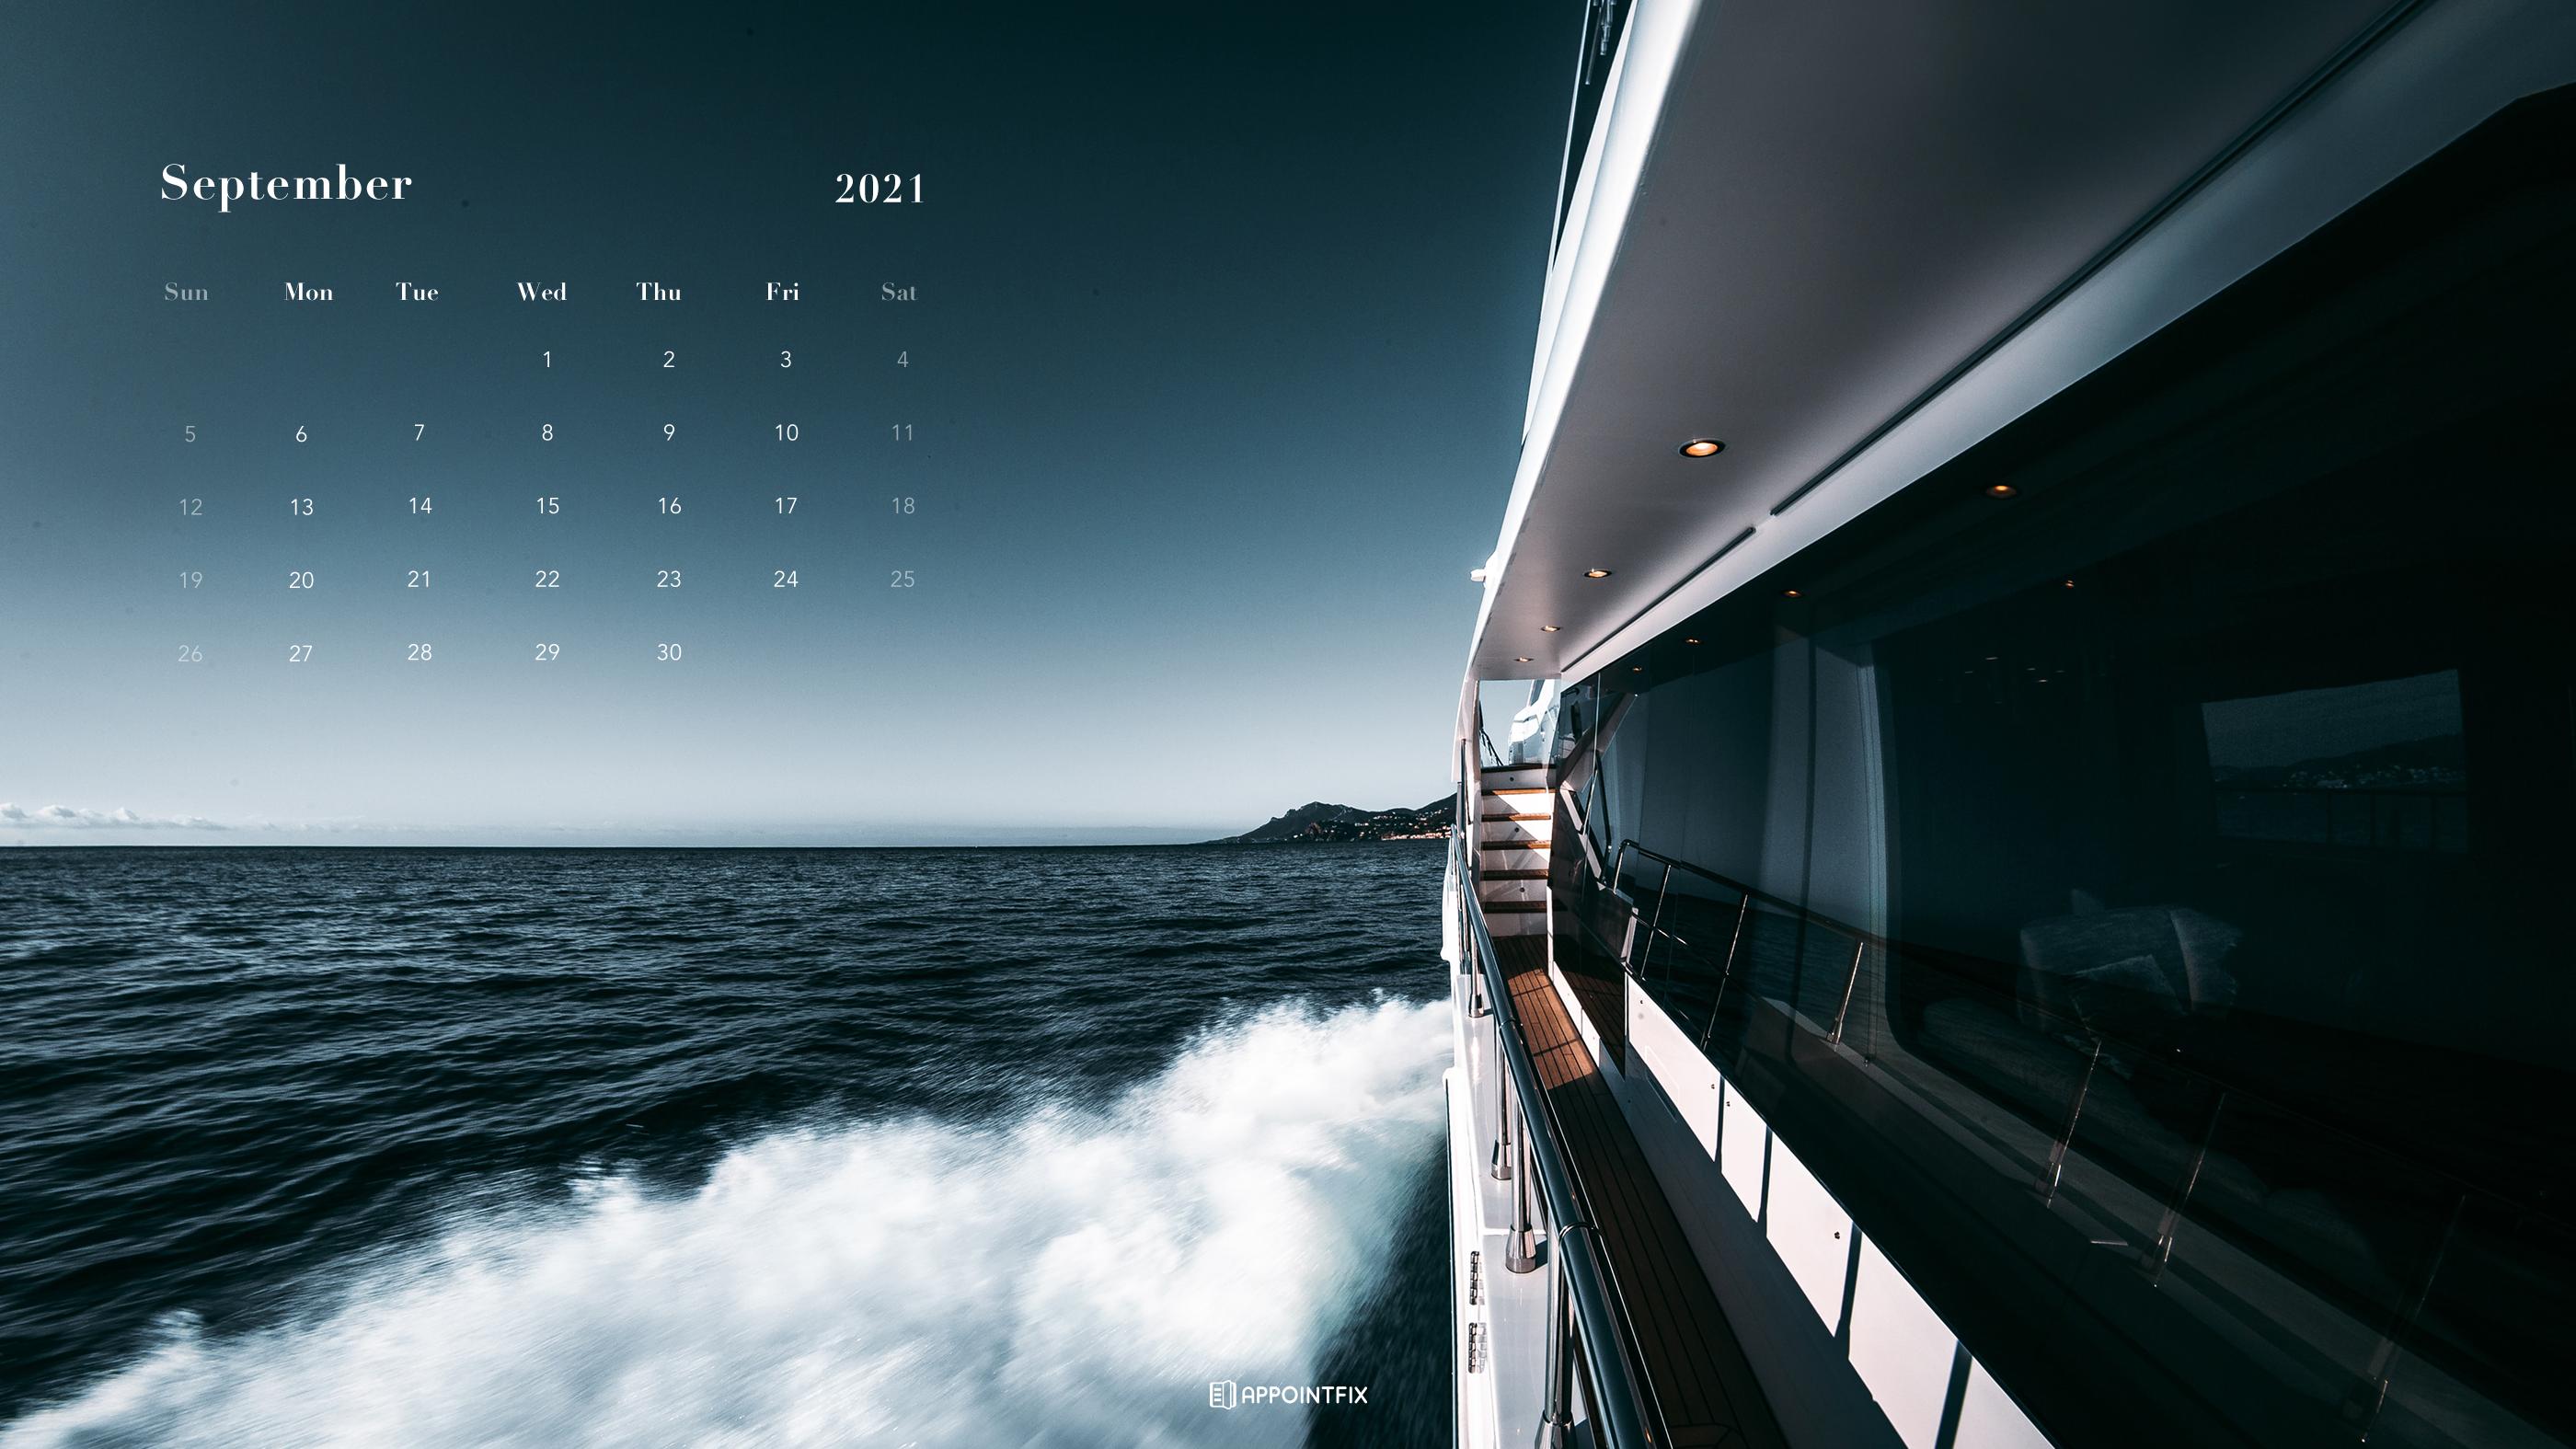 September 2021 Calendar Wallpapers Desktop Mobile 2800x1575